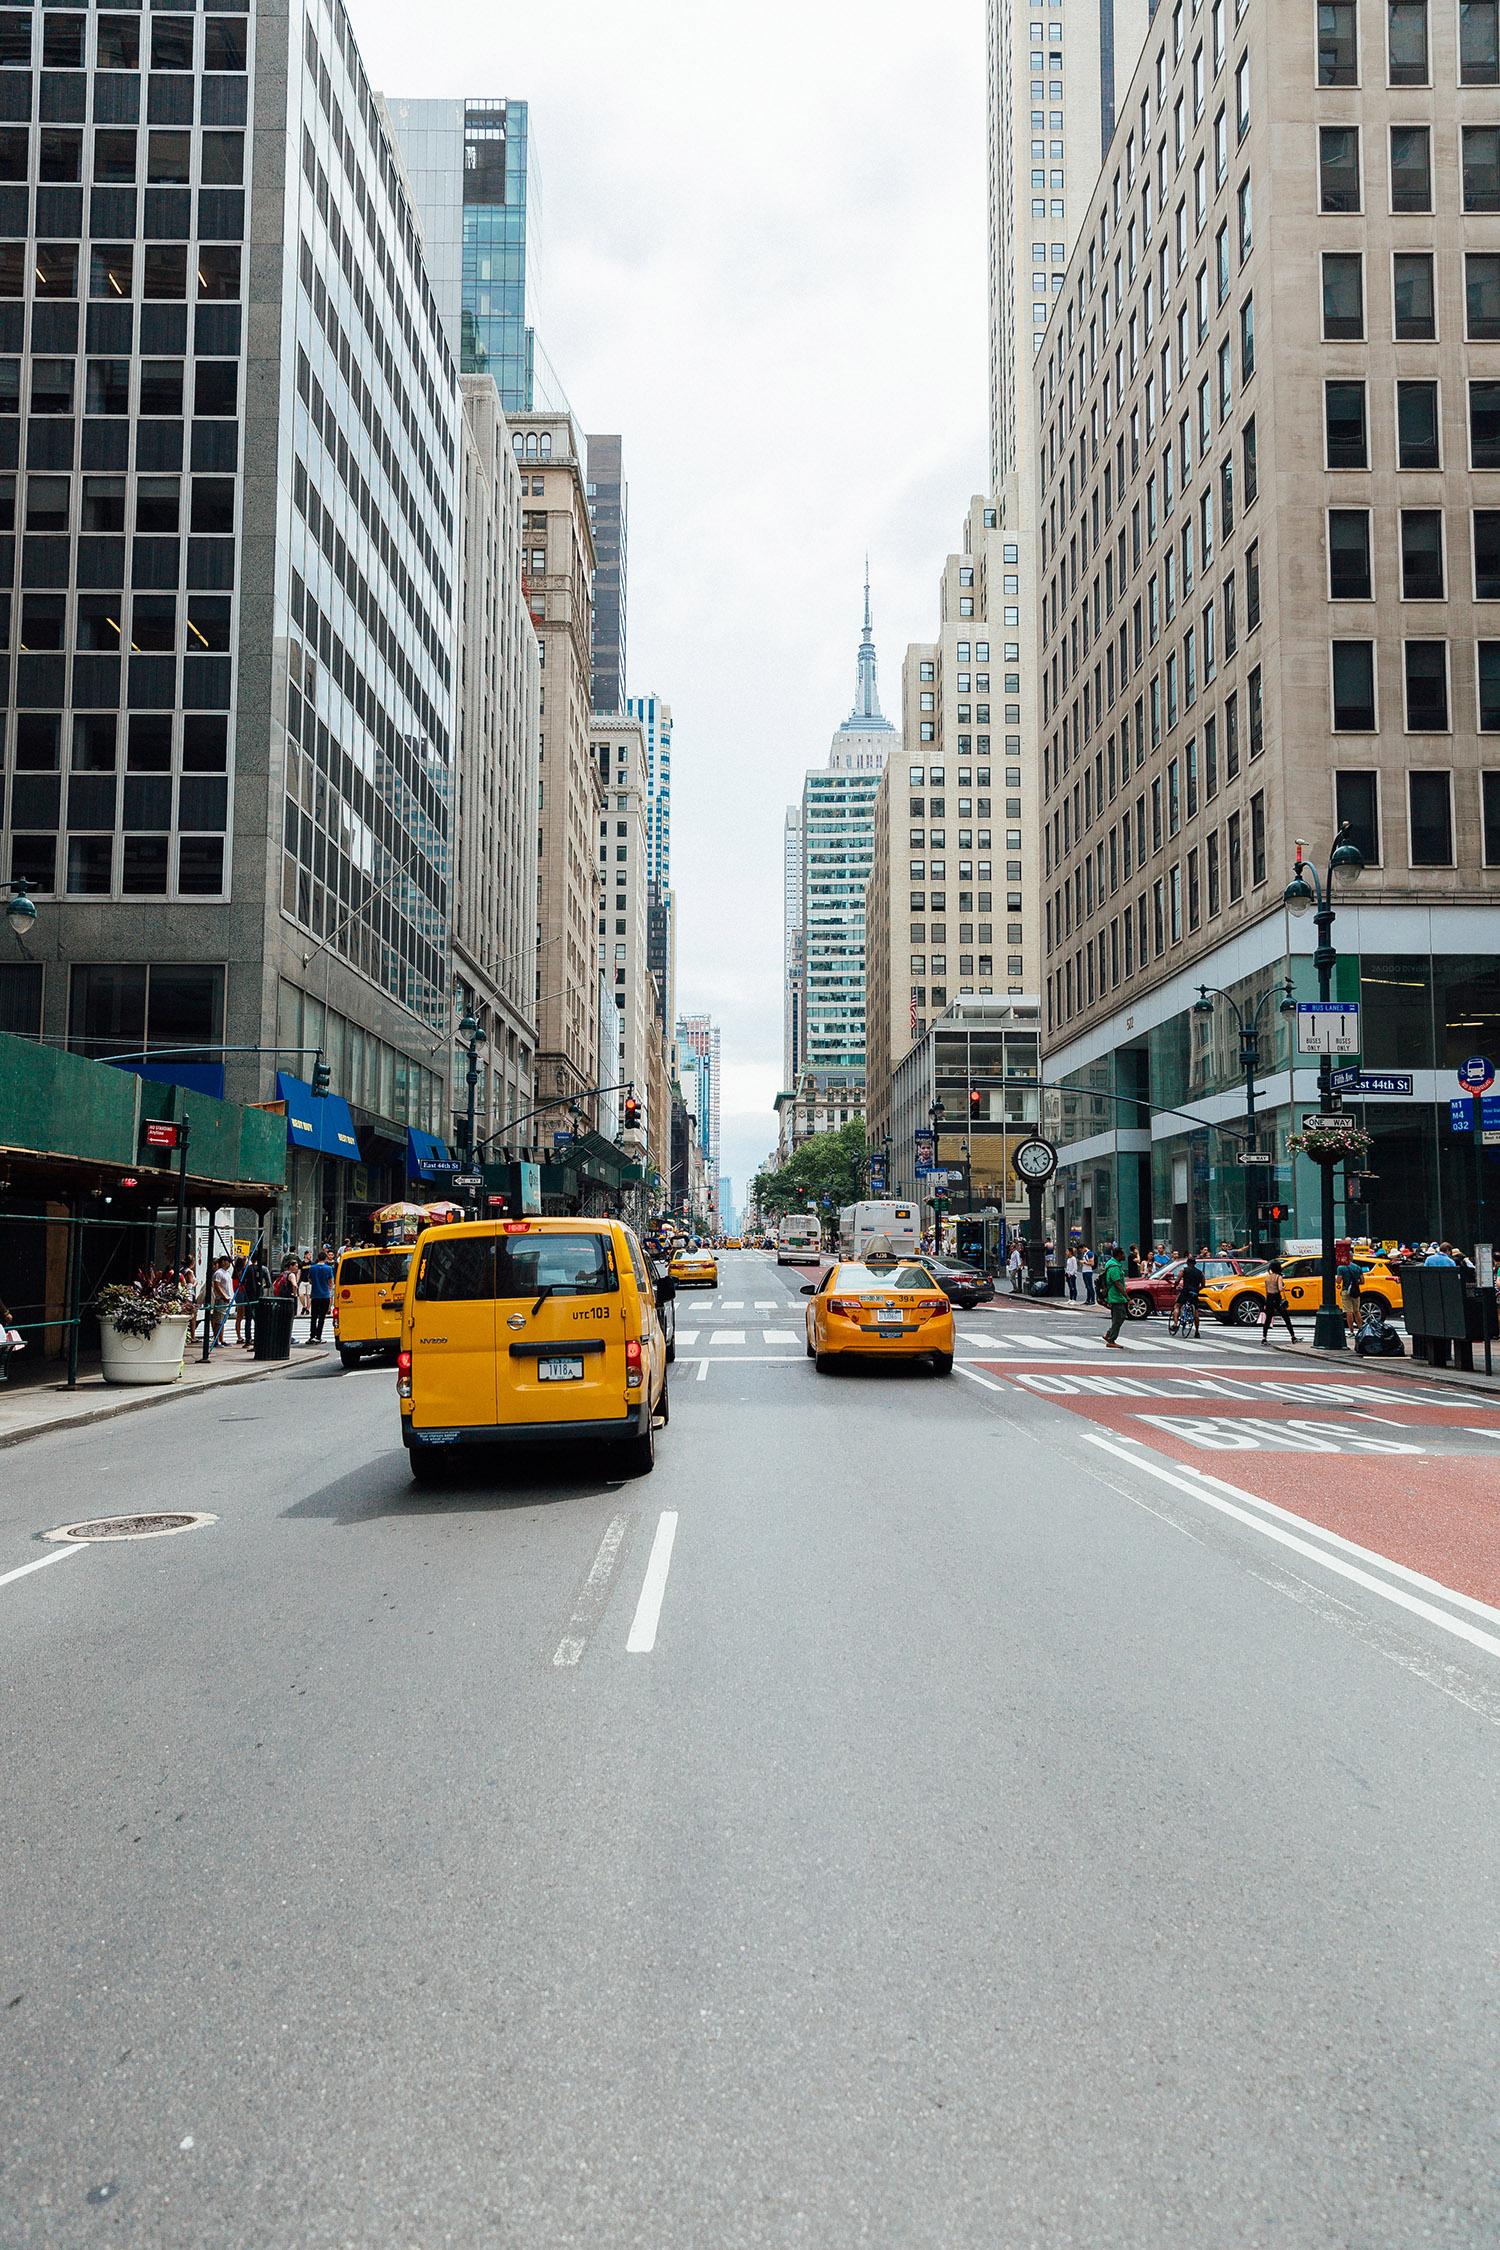 NYC_072018 (25 of 36).jpg